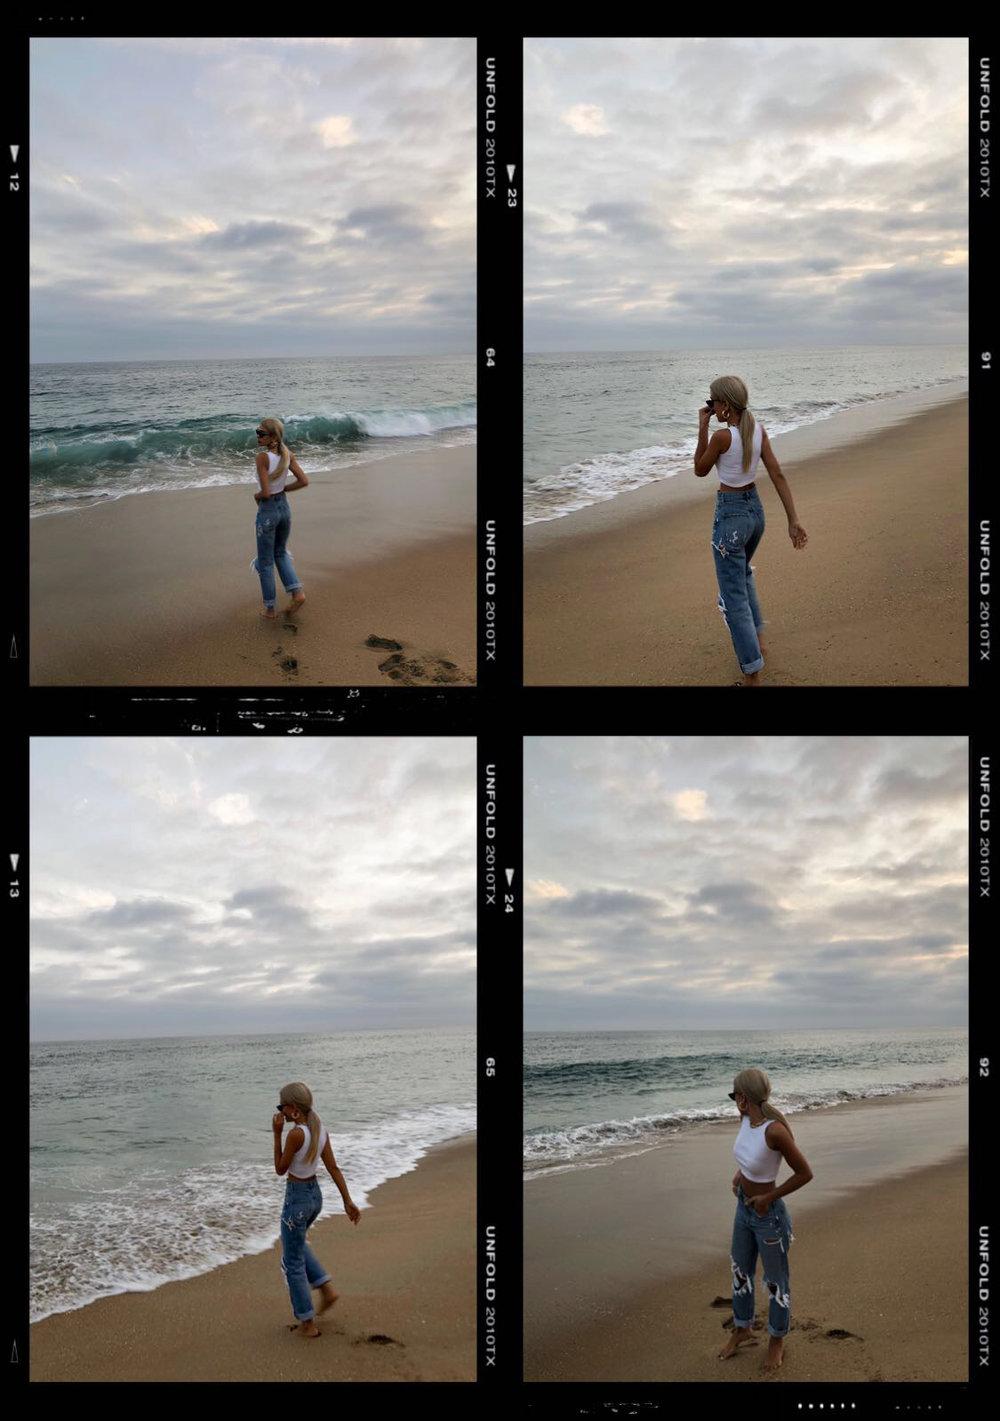 Beach_Drinks_01